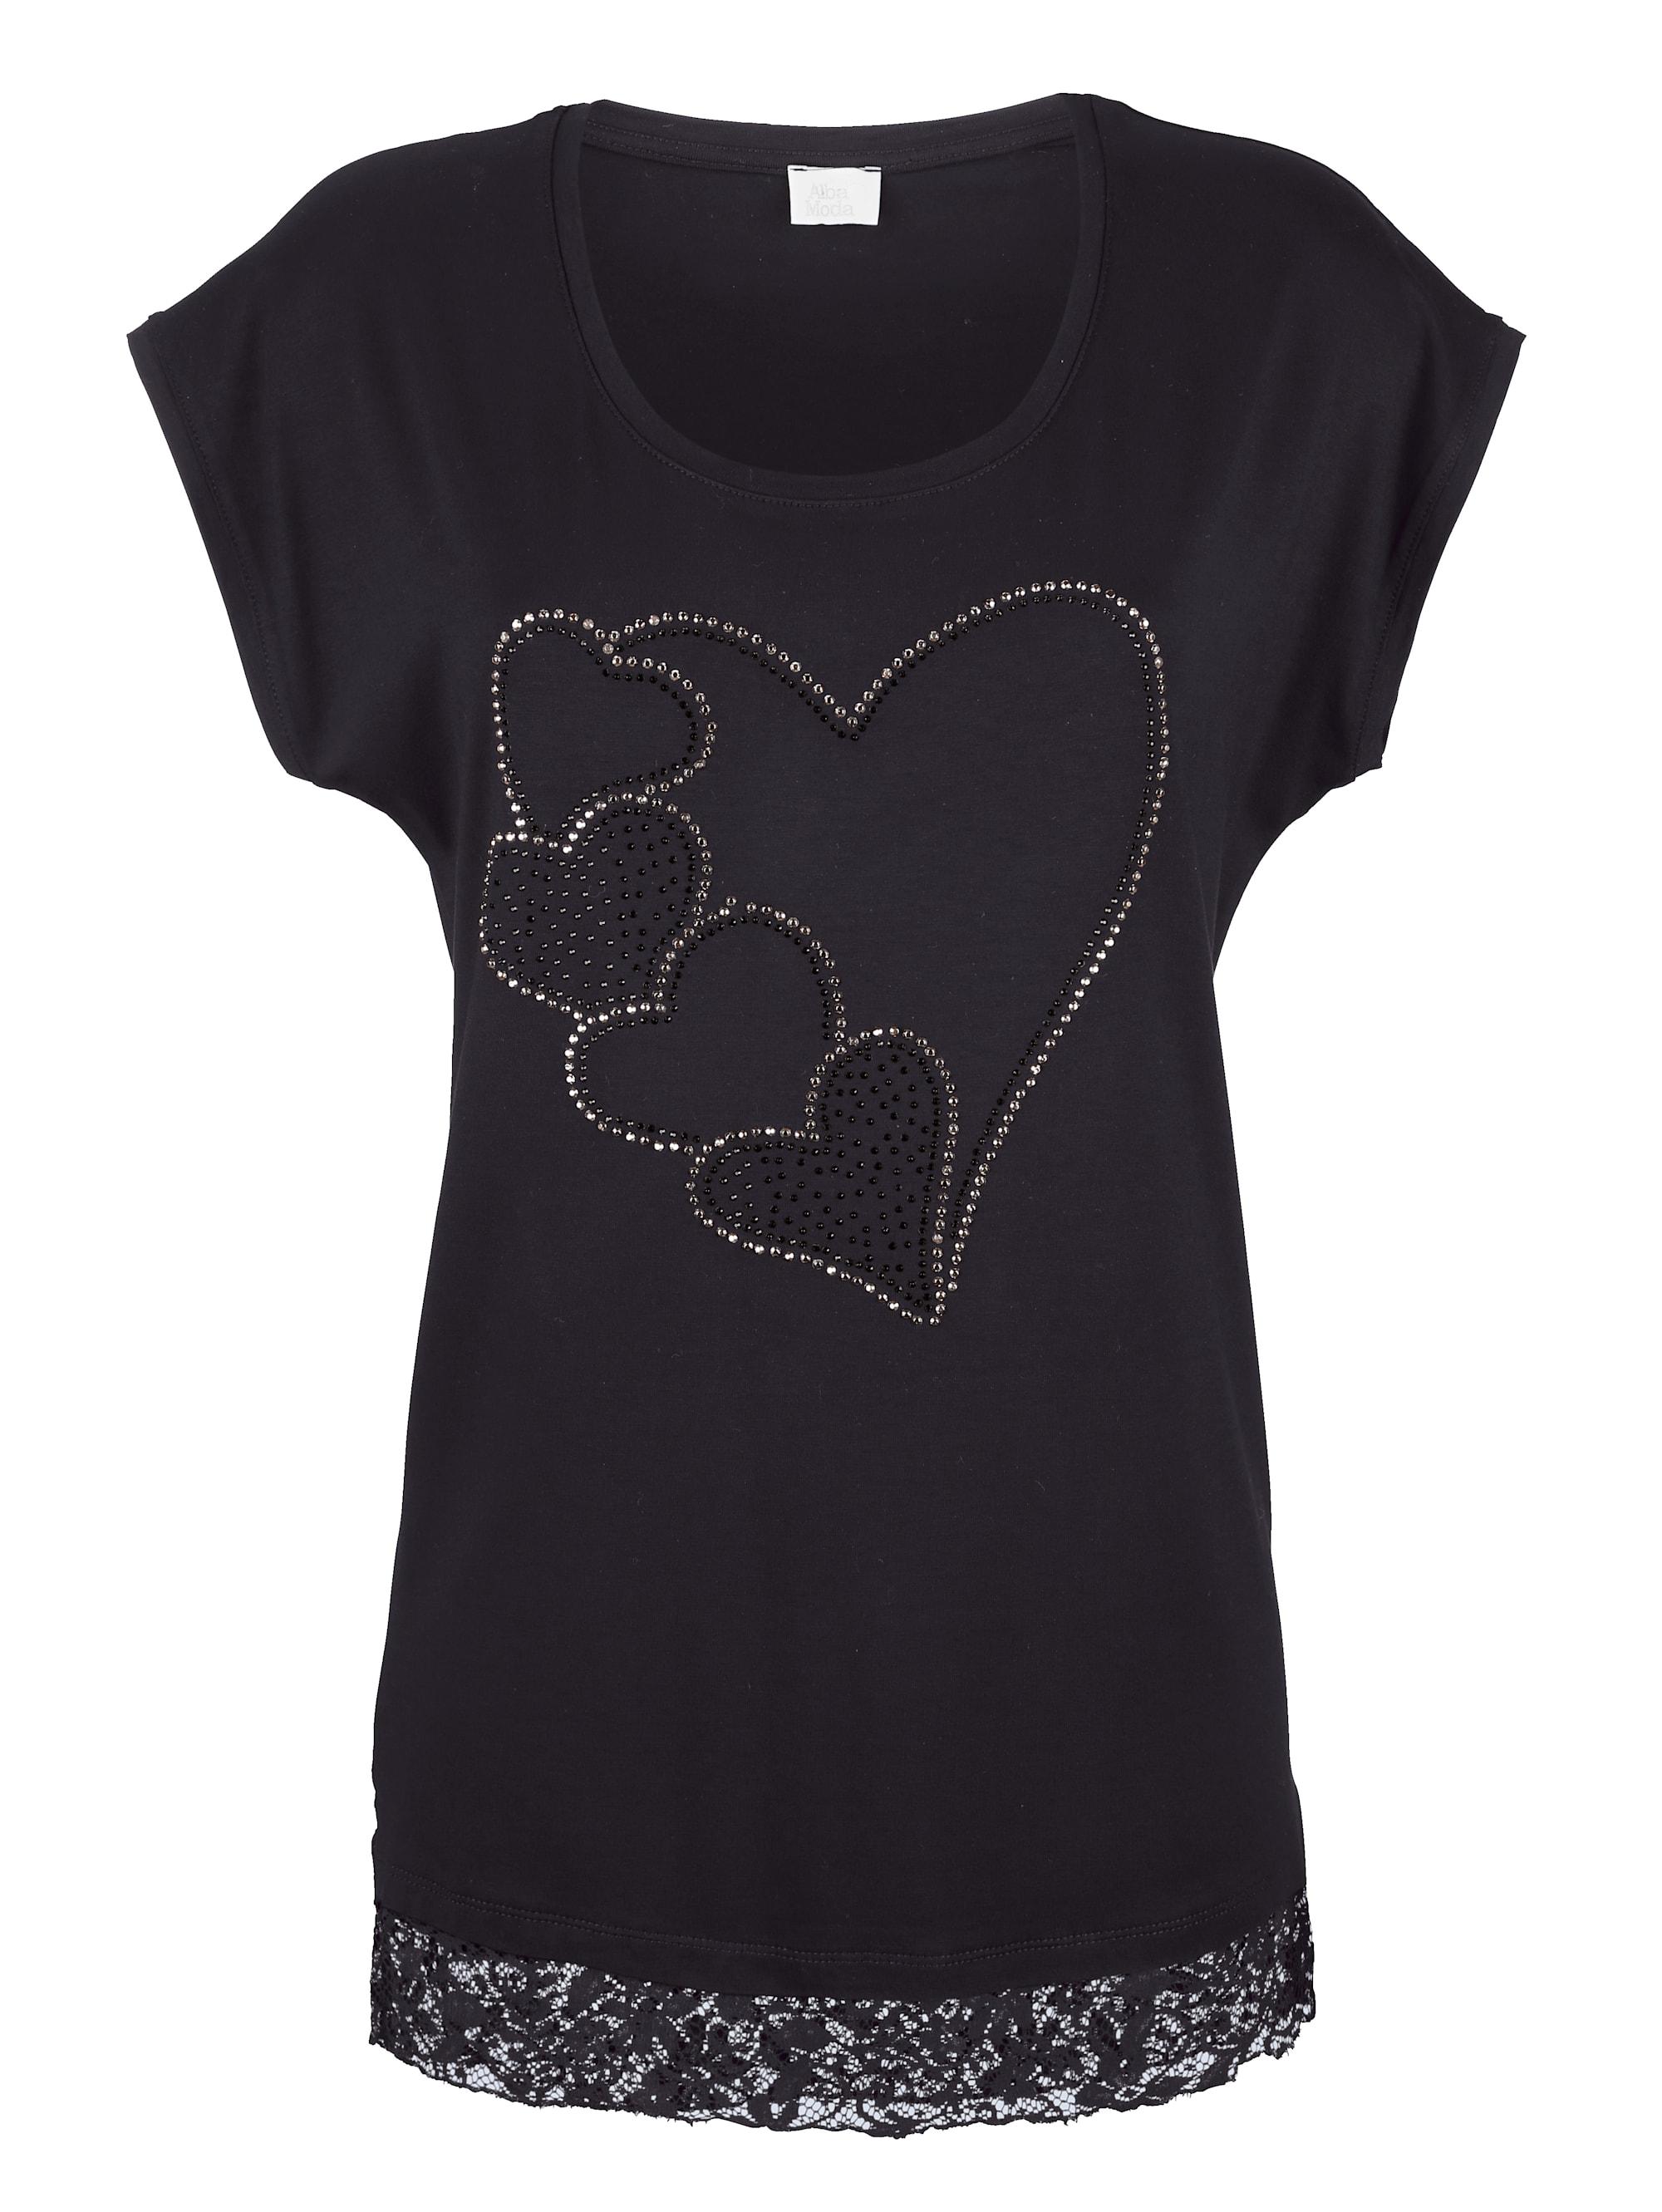 Alba Moda Shirt mit Herzmotiv QgcWl HqF0E